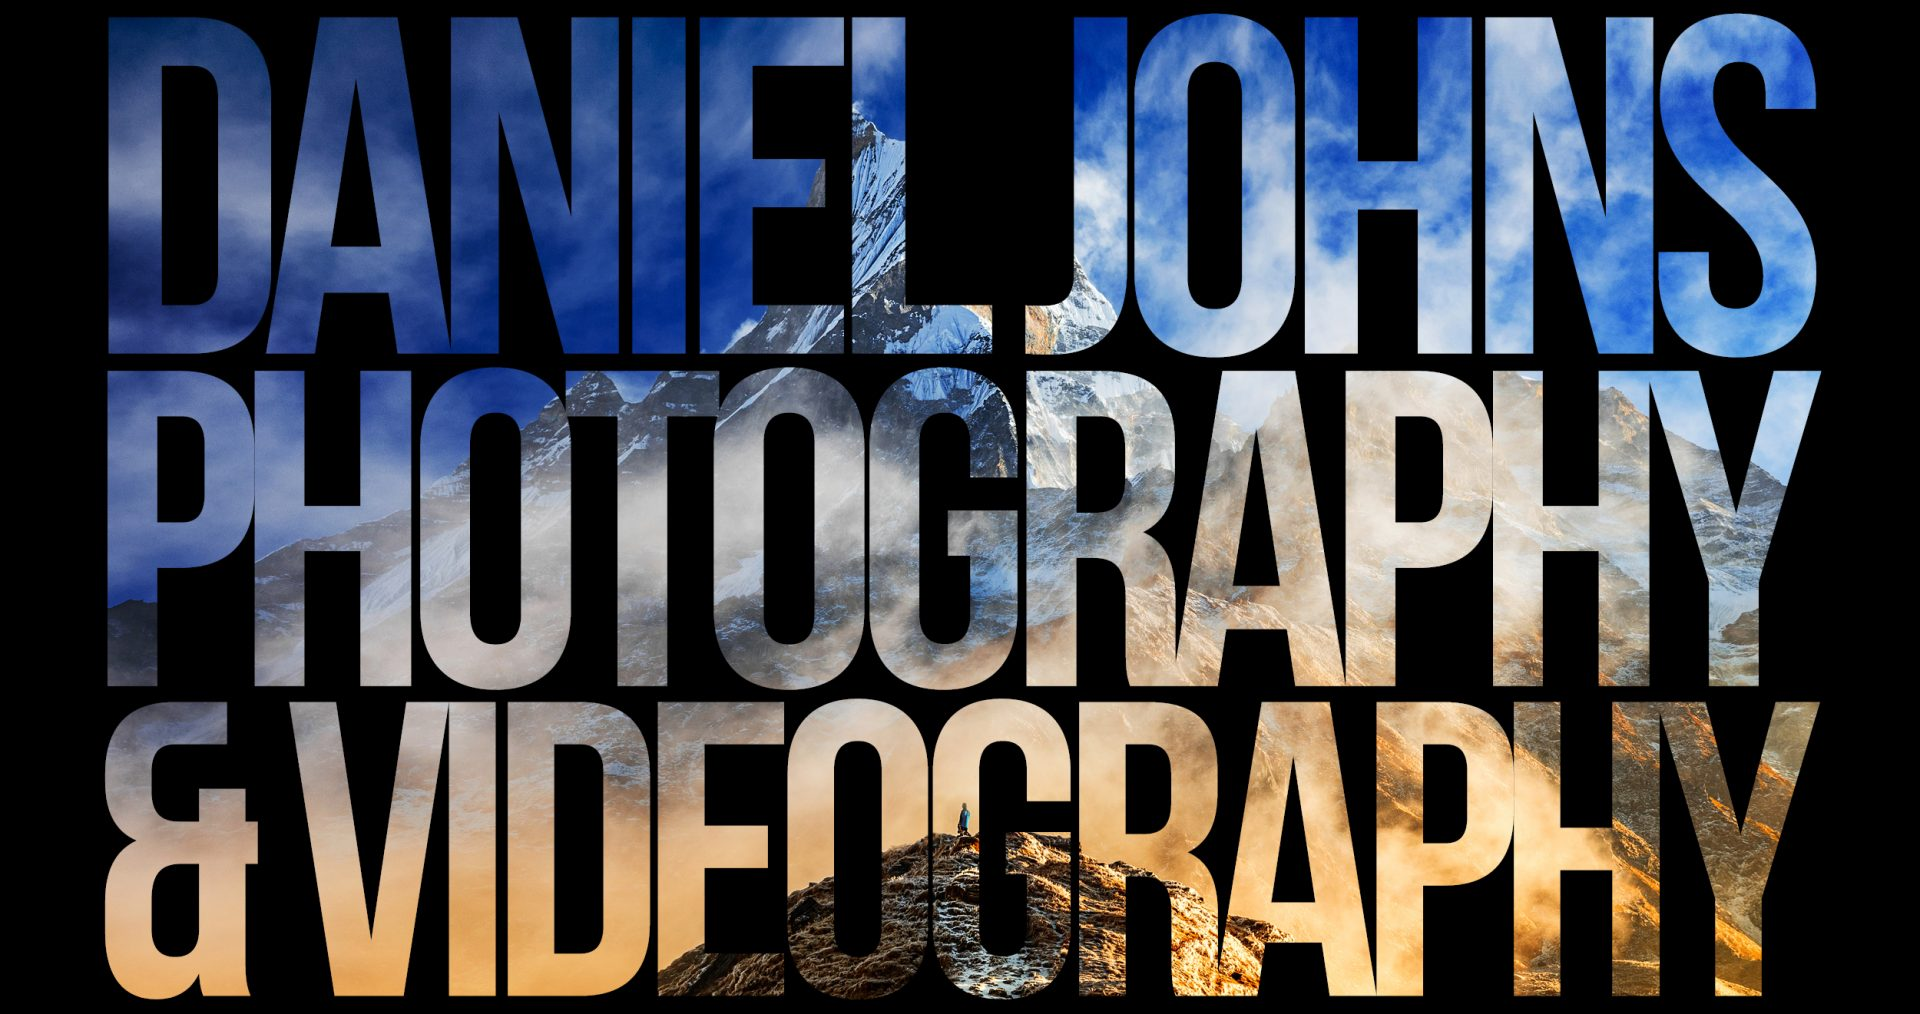 Daniel Johns Portfolio